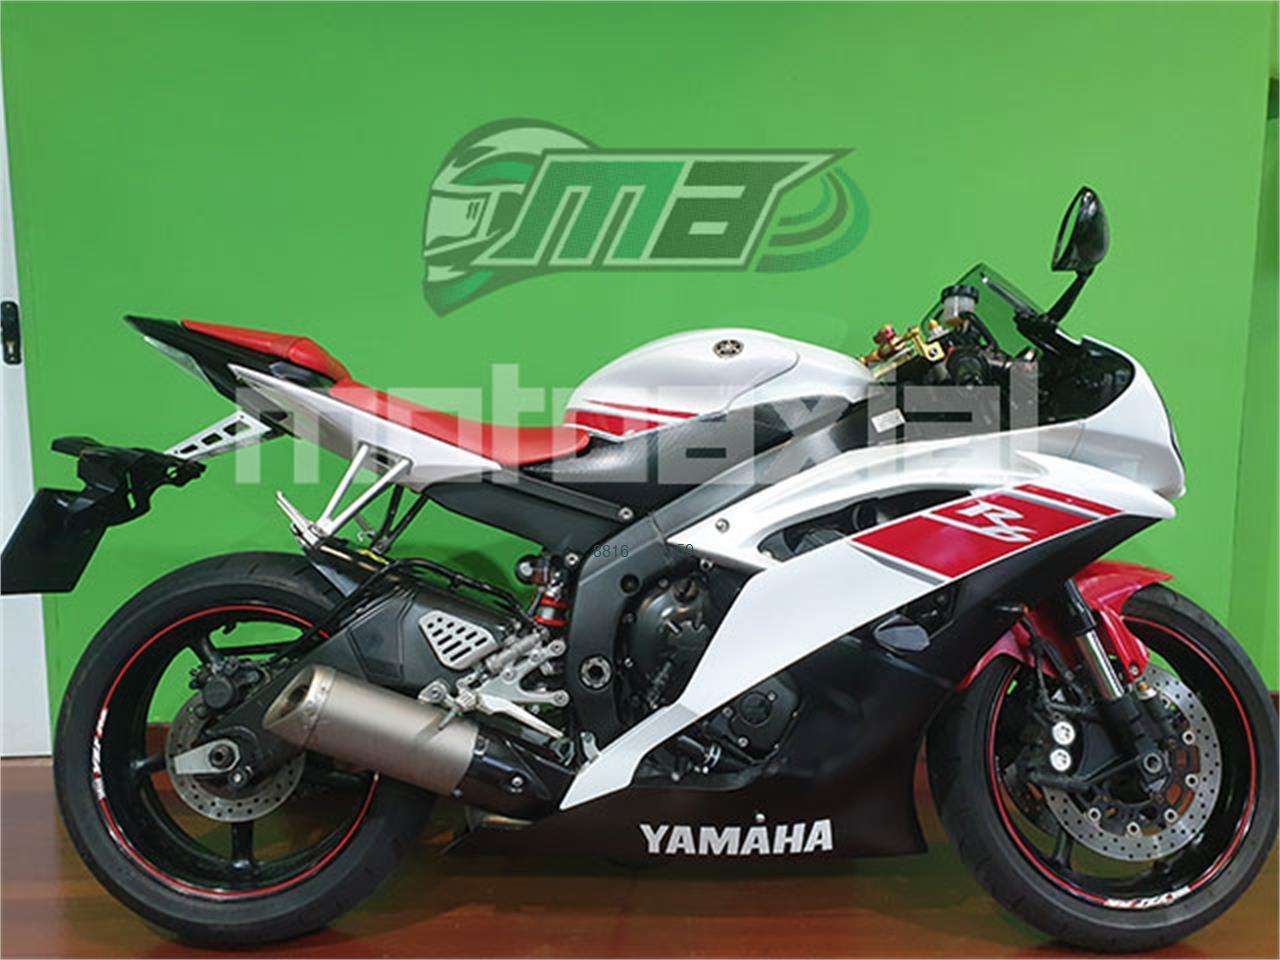 YAMAHA YZF R6 de venta